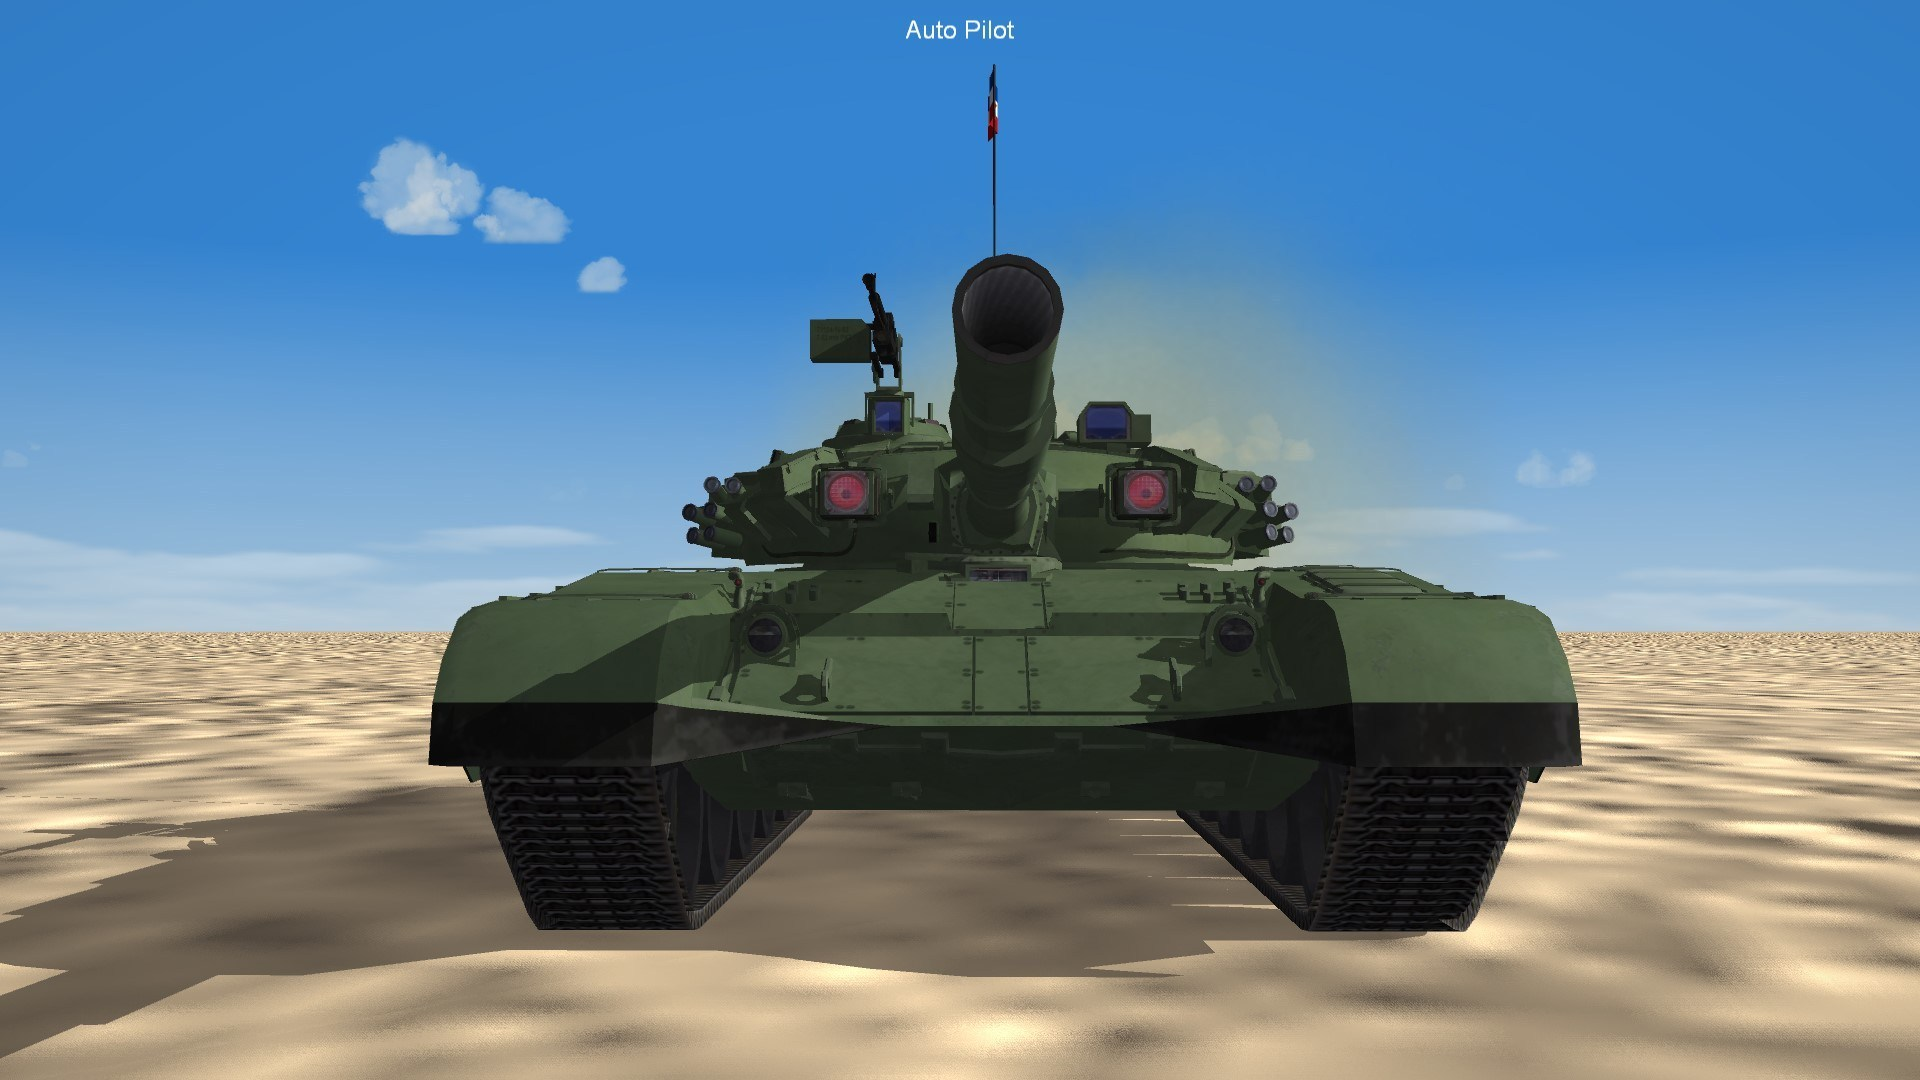 M-84AS / M-84AB1 Yugoslav MBT